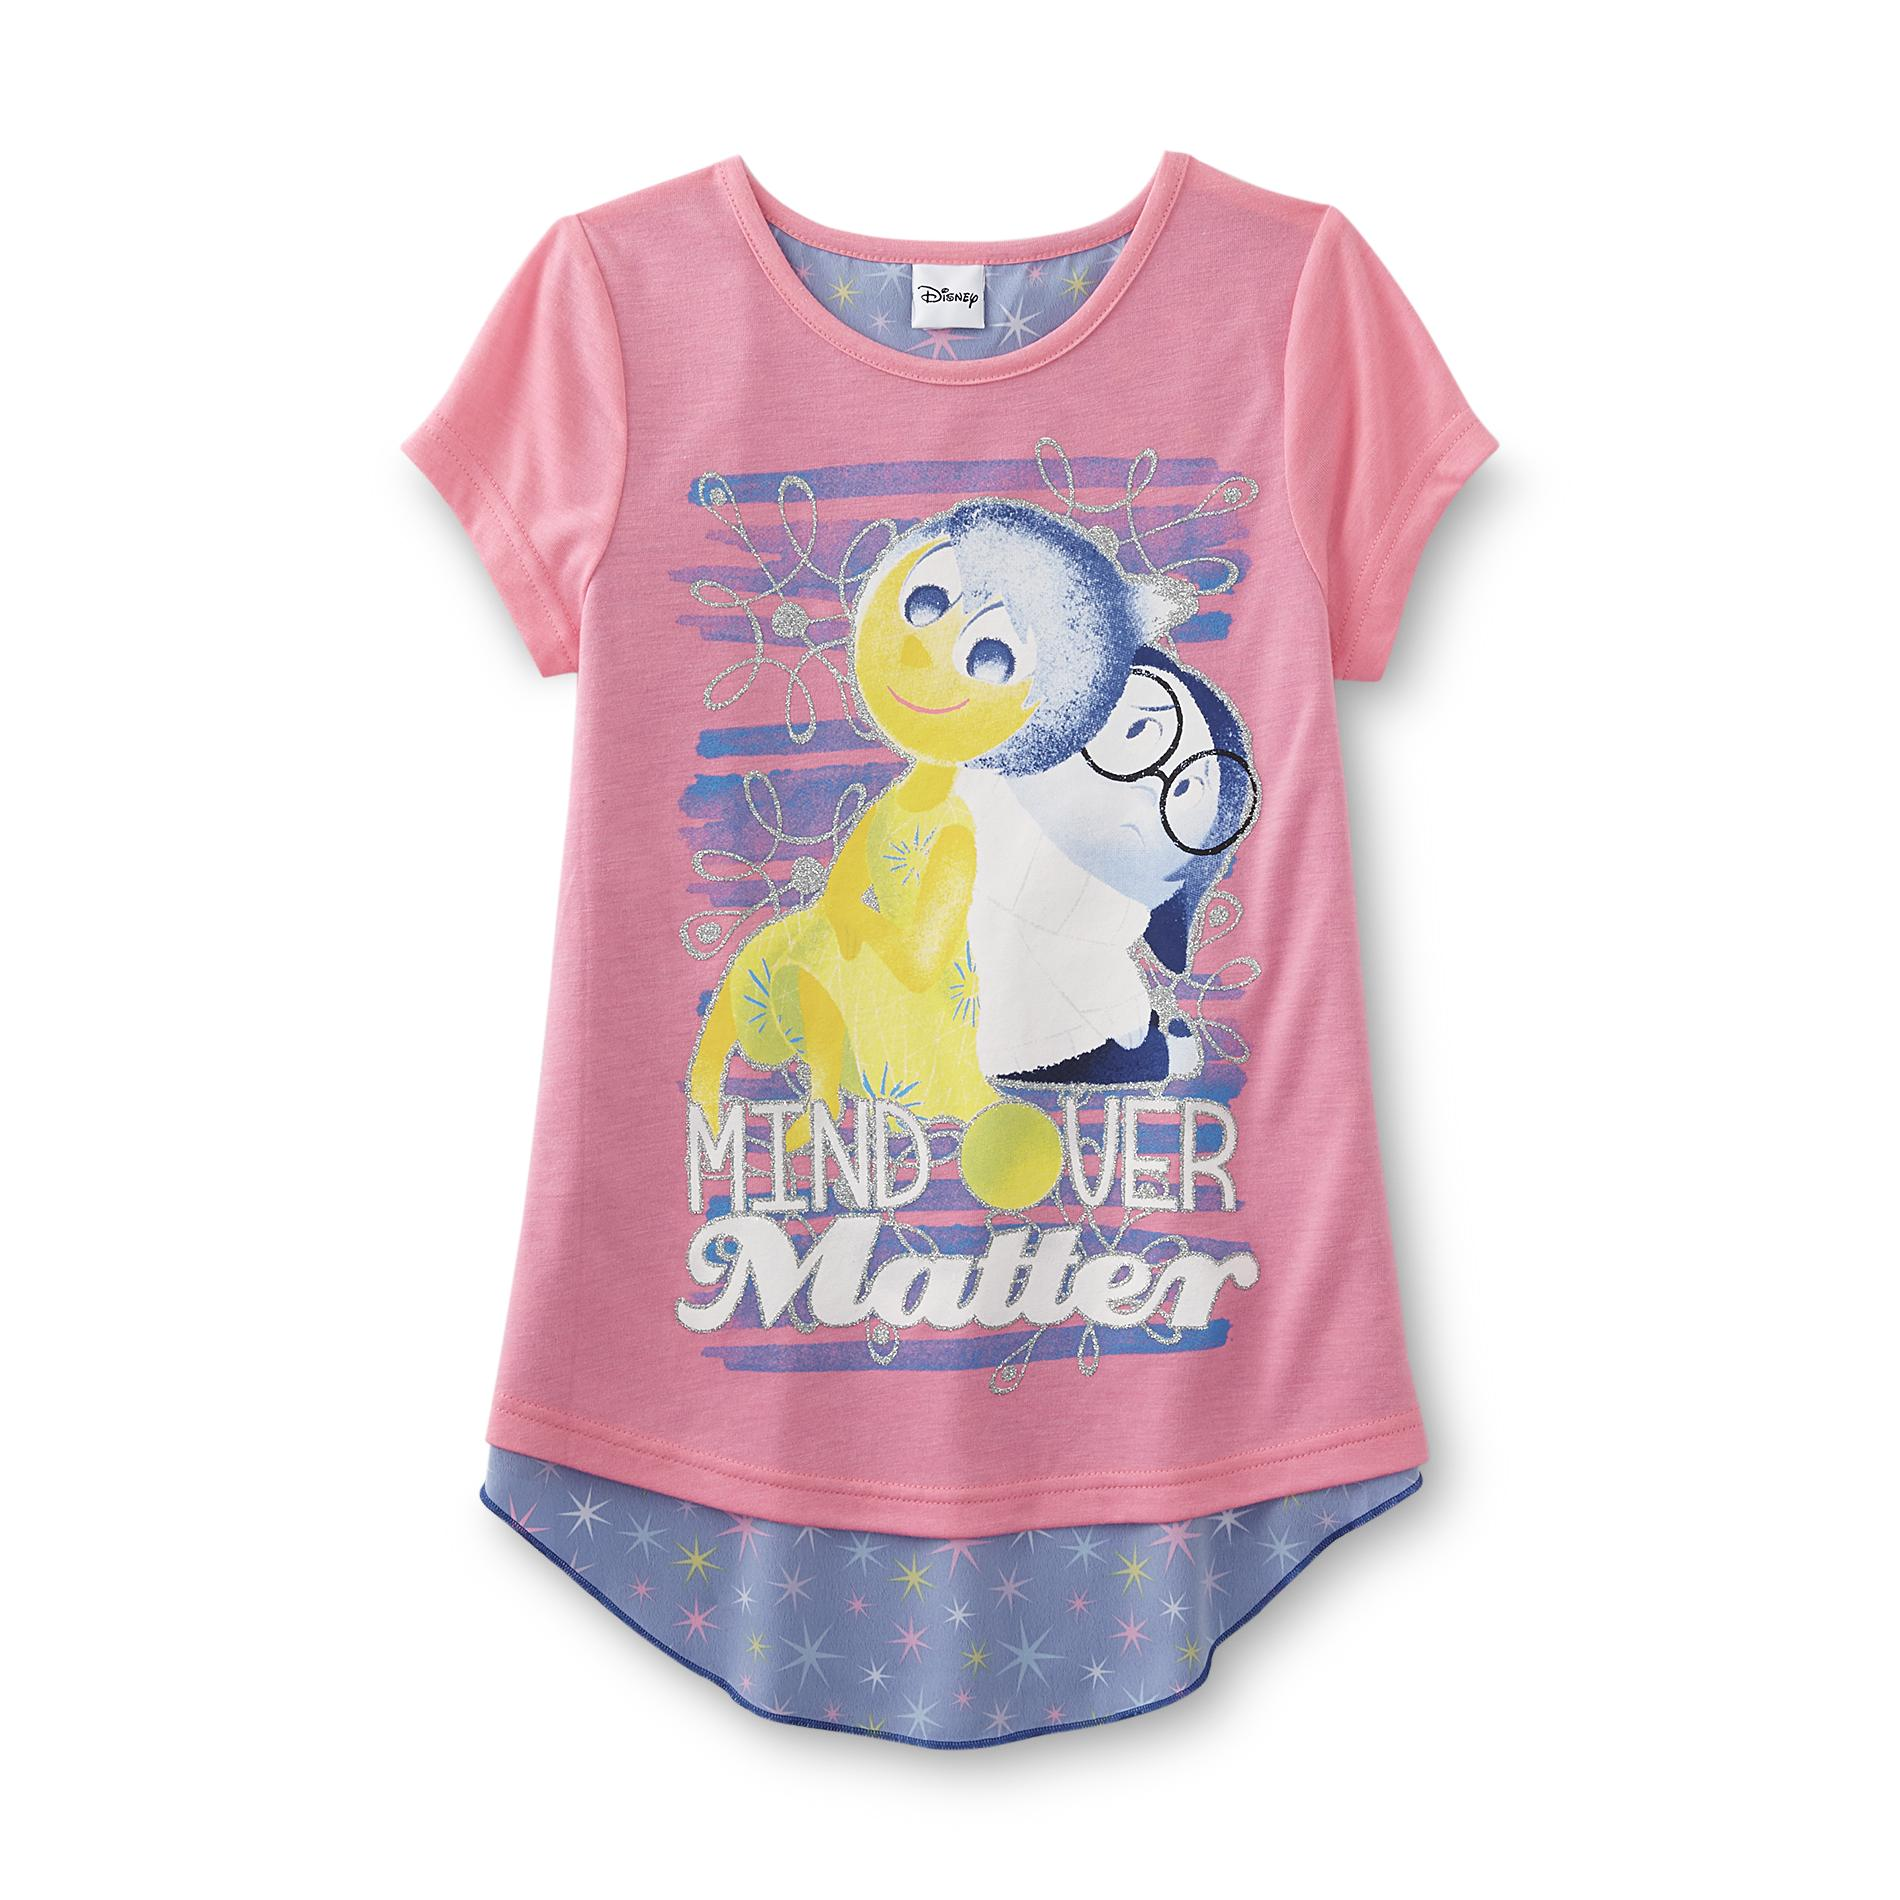 Disney Inside Out Girl's Split-Back Graphic T-Shirt PartNumber: 049VA86924212P MfgPartNumber: DI8222905